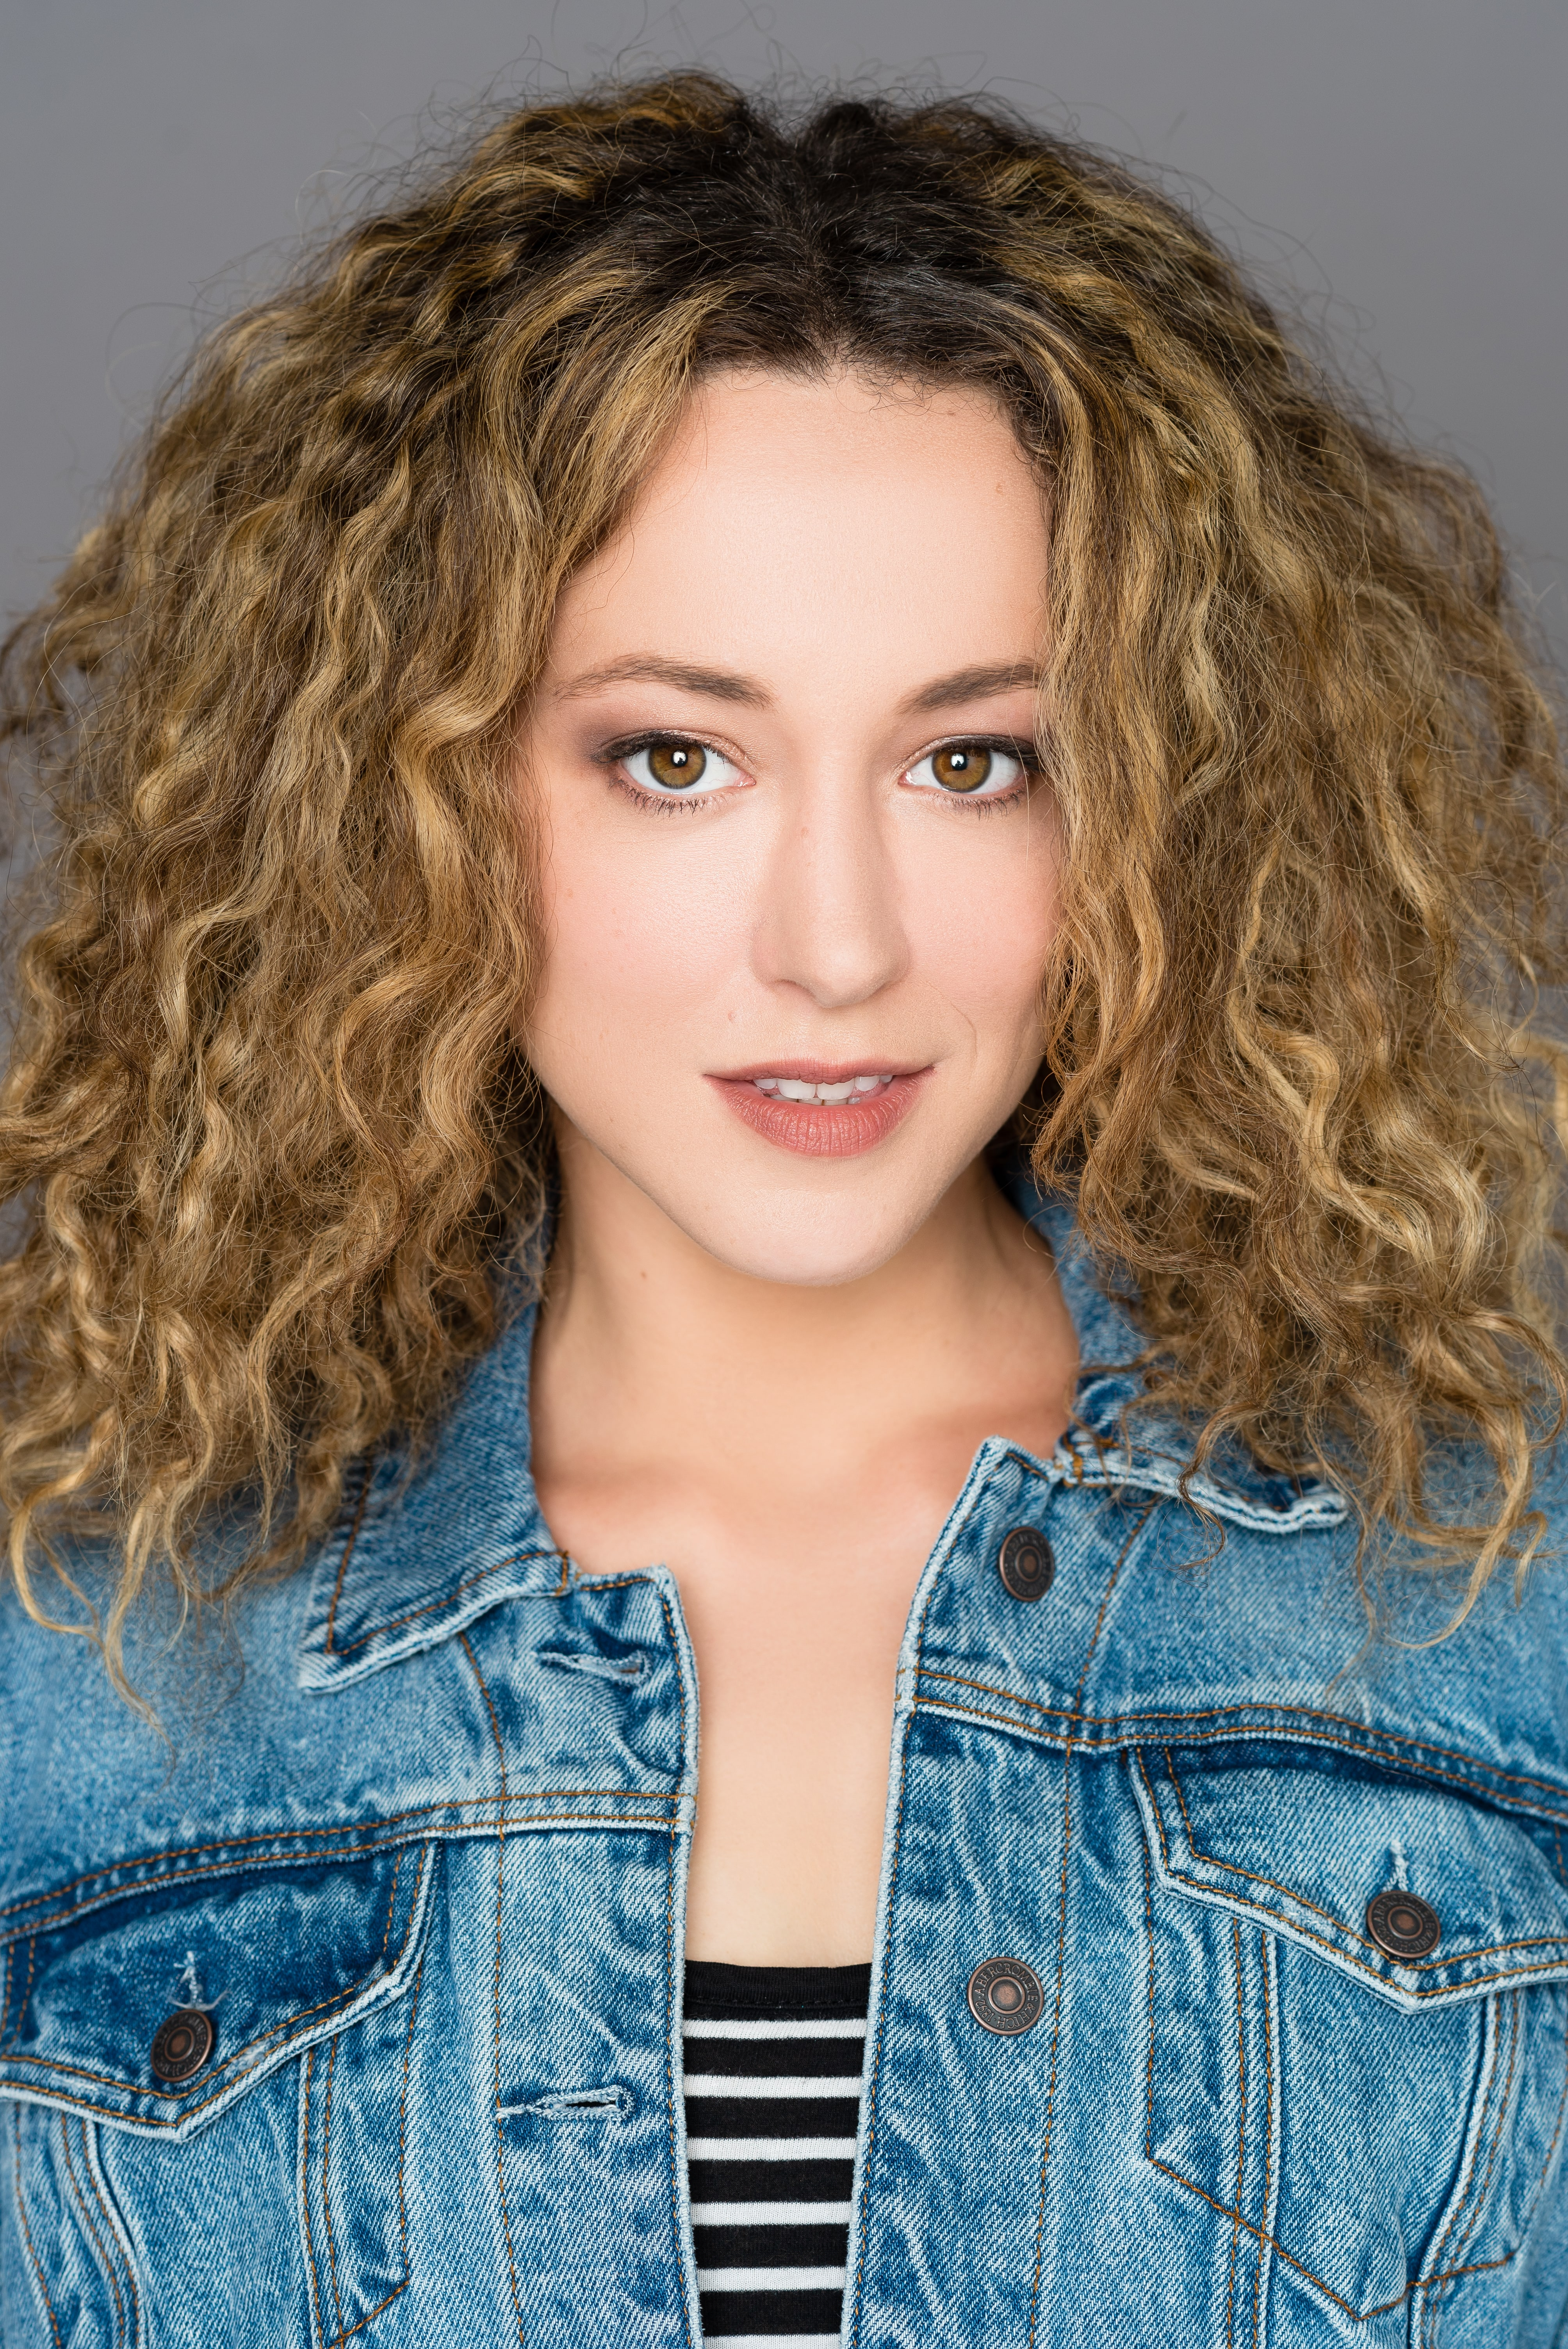 Haley Shannon